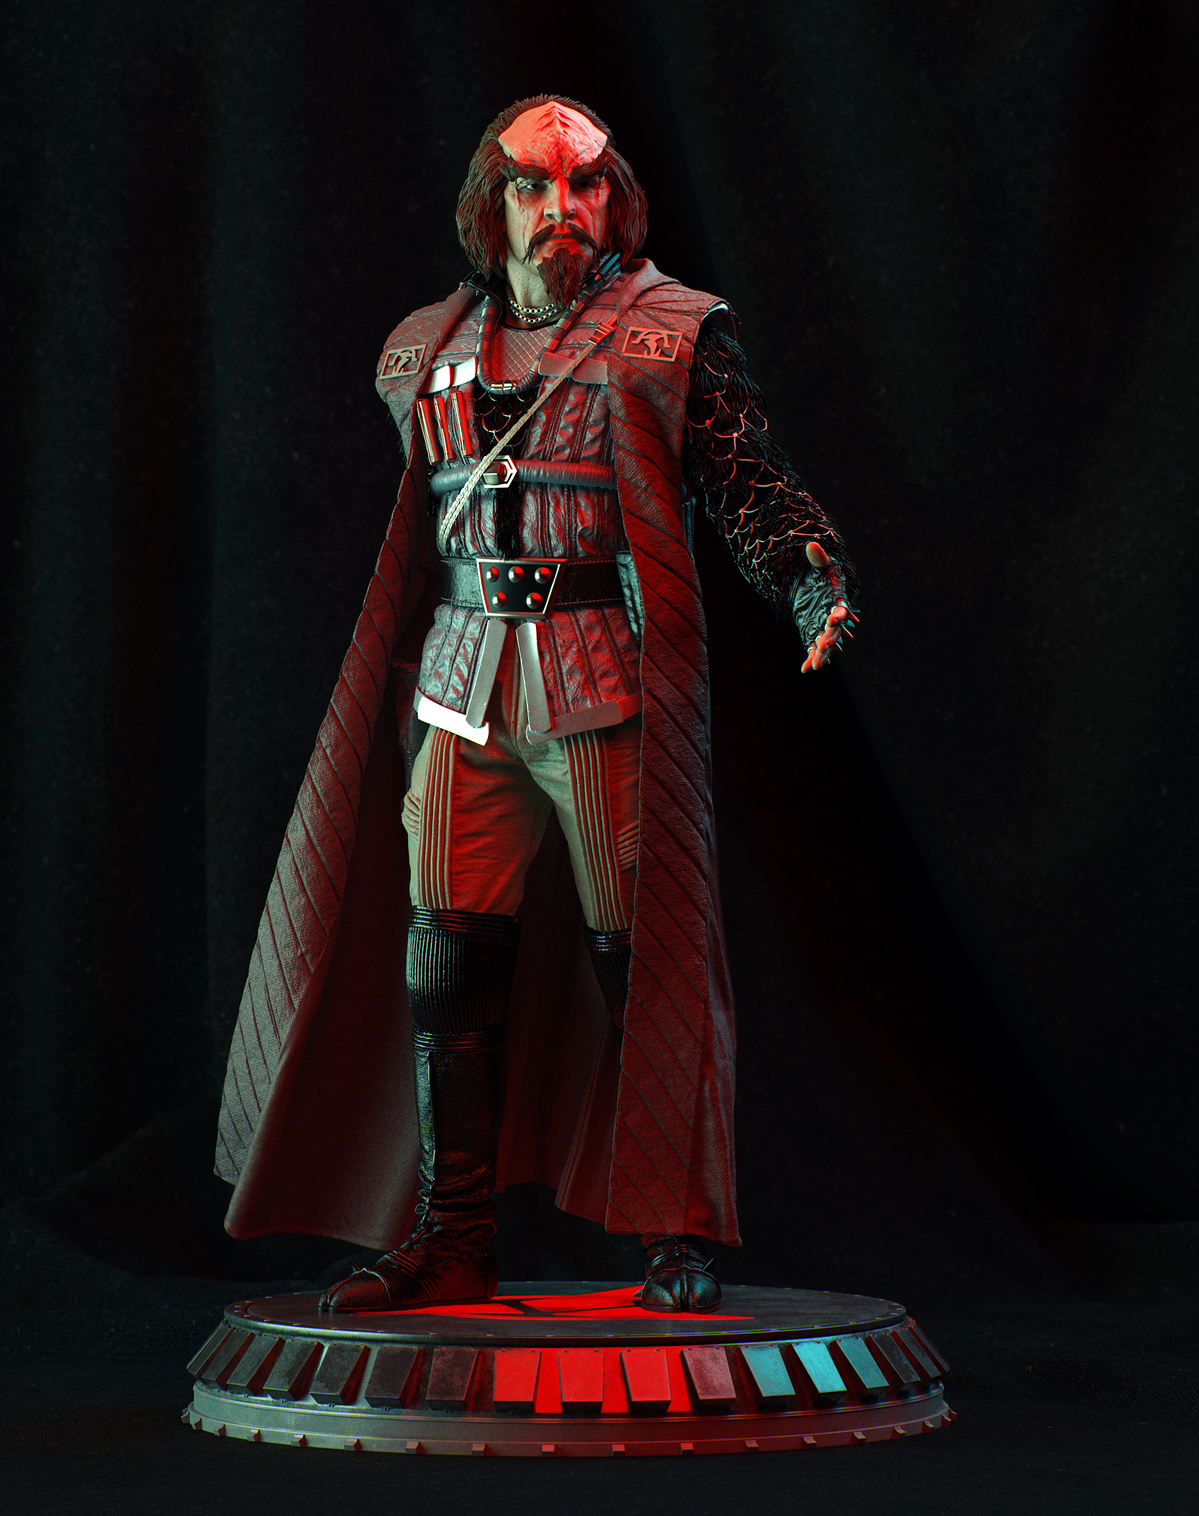 Klingon_Red_5